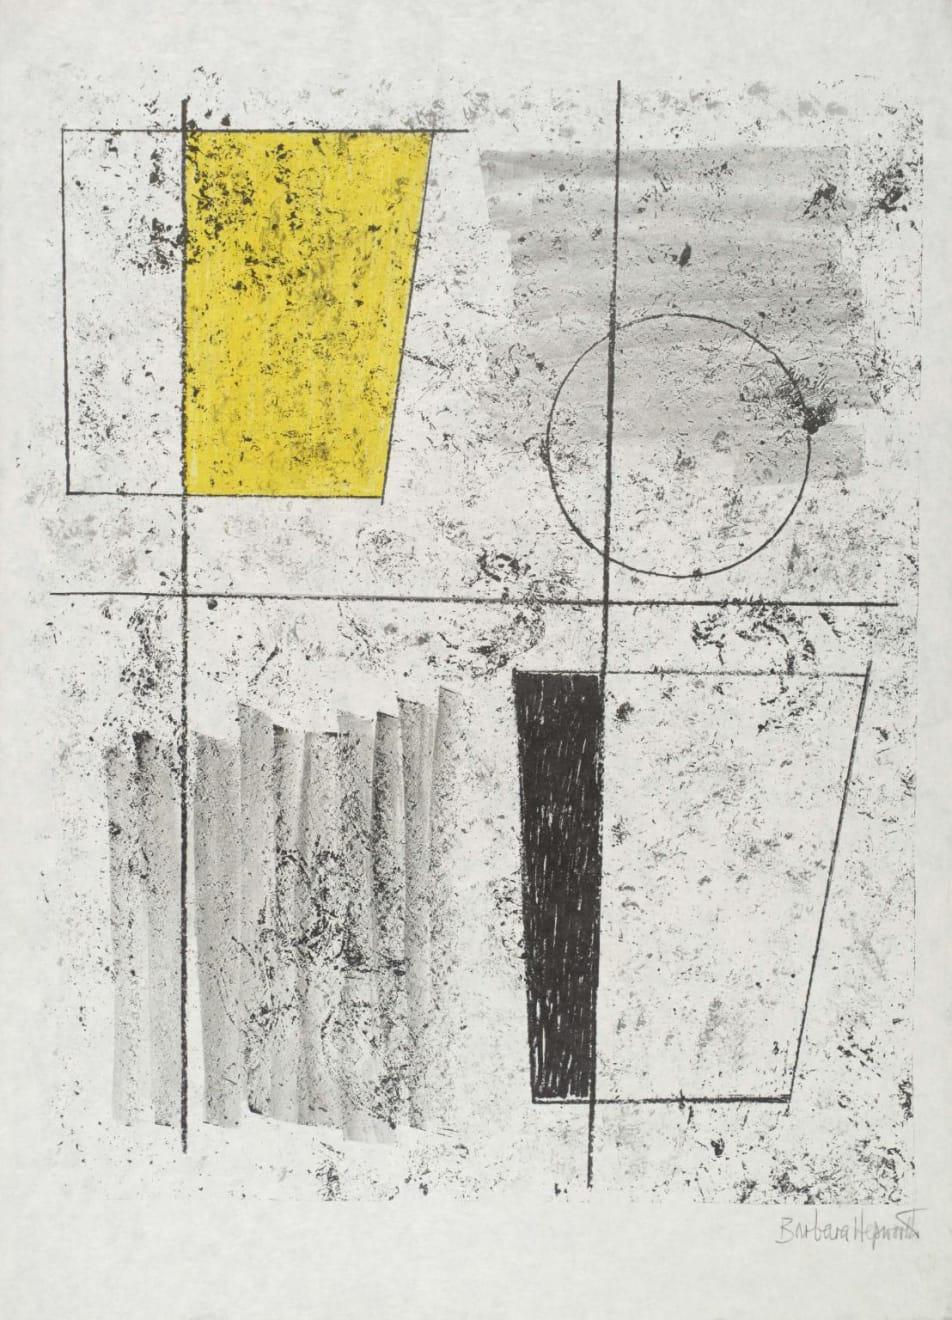 Barbara Hepworth, Three Forms Assembling, 1968-1969